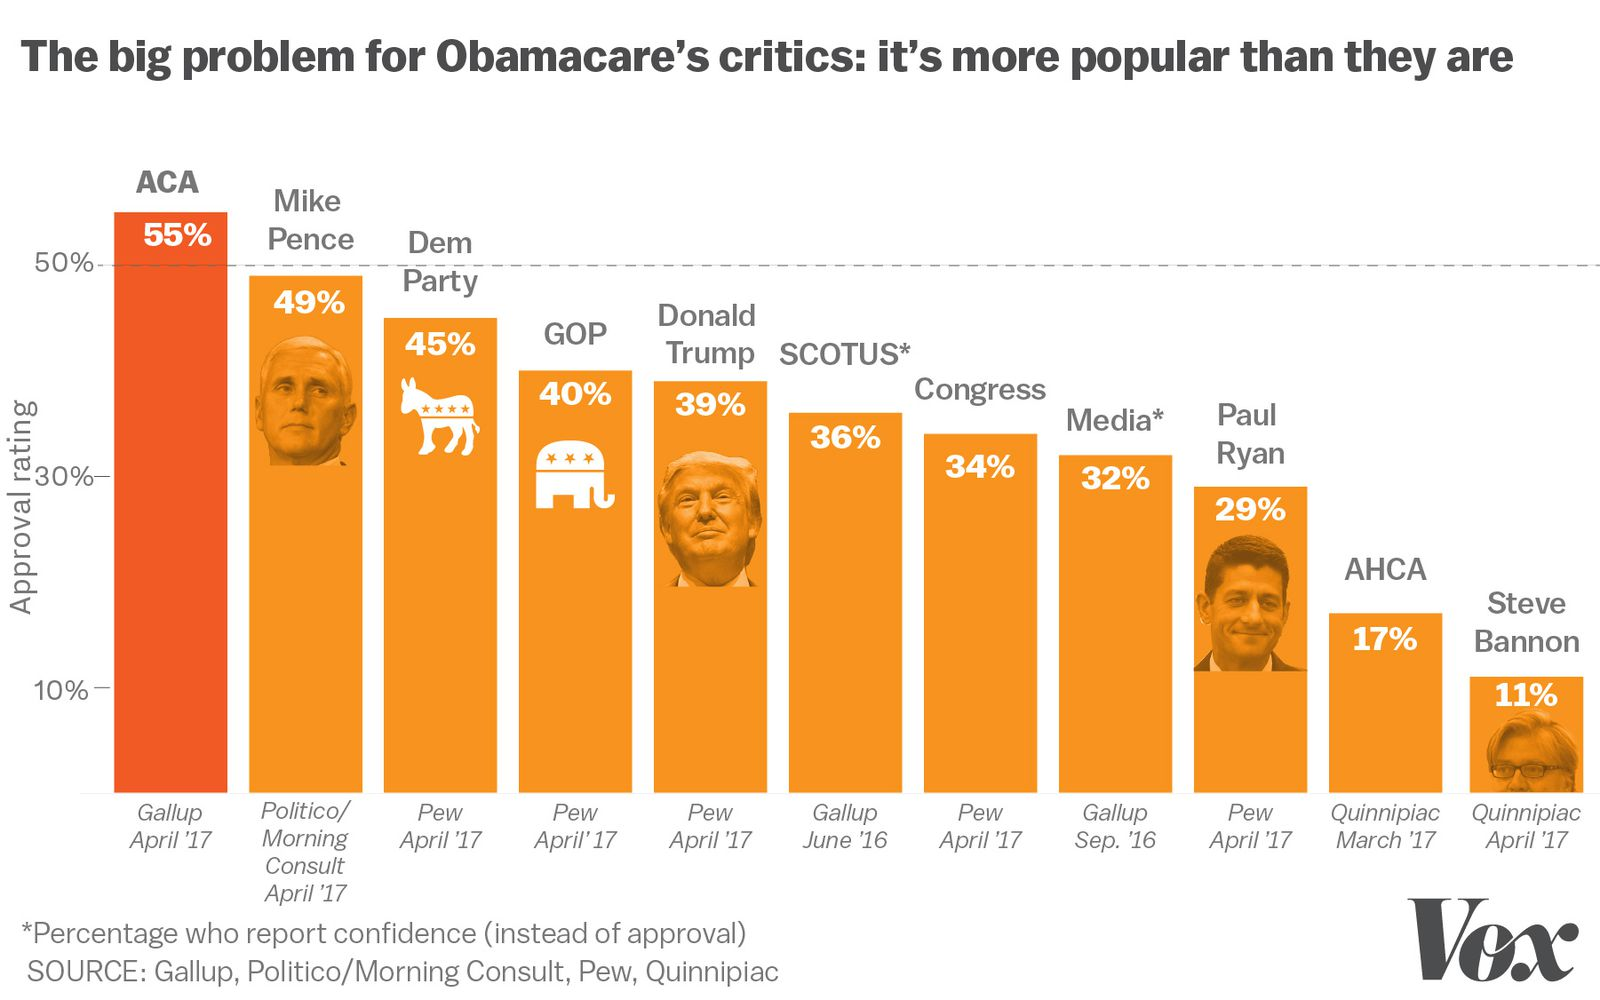 obamacare popularity